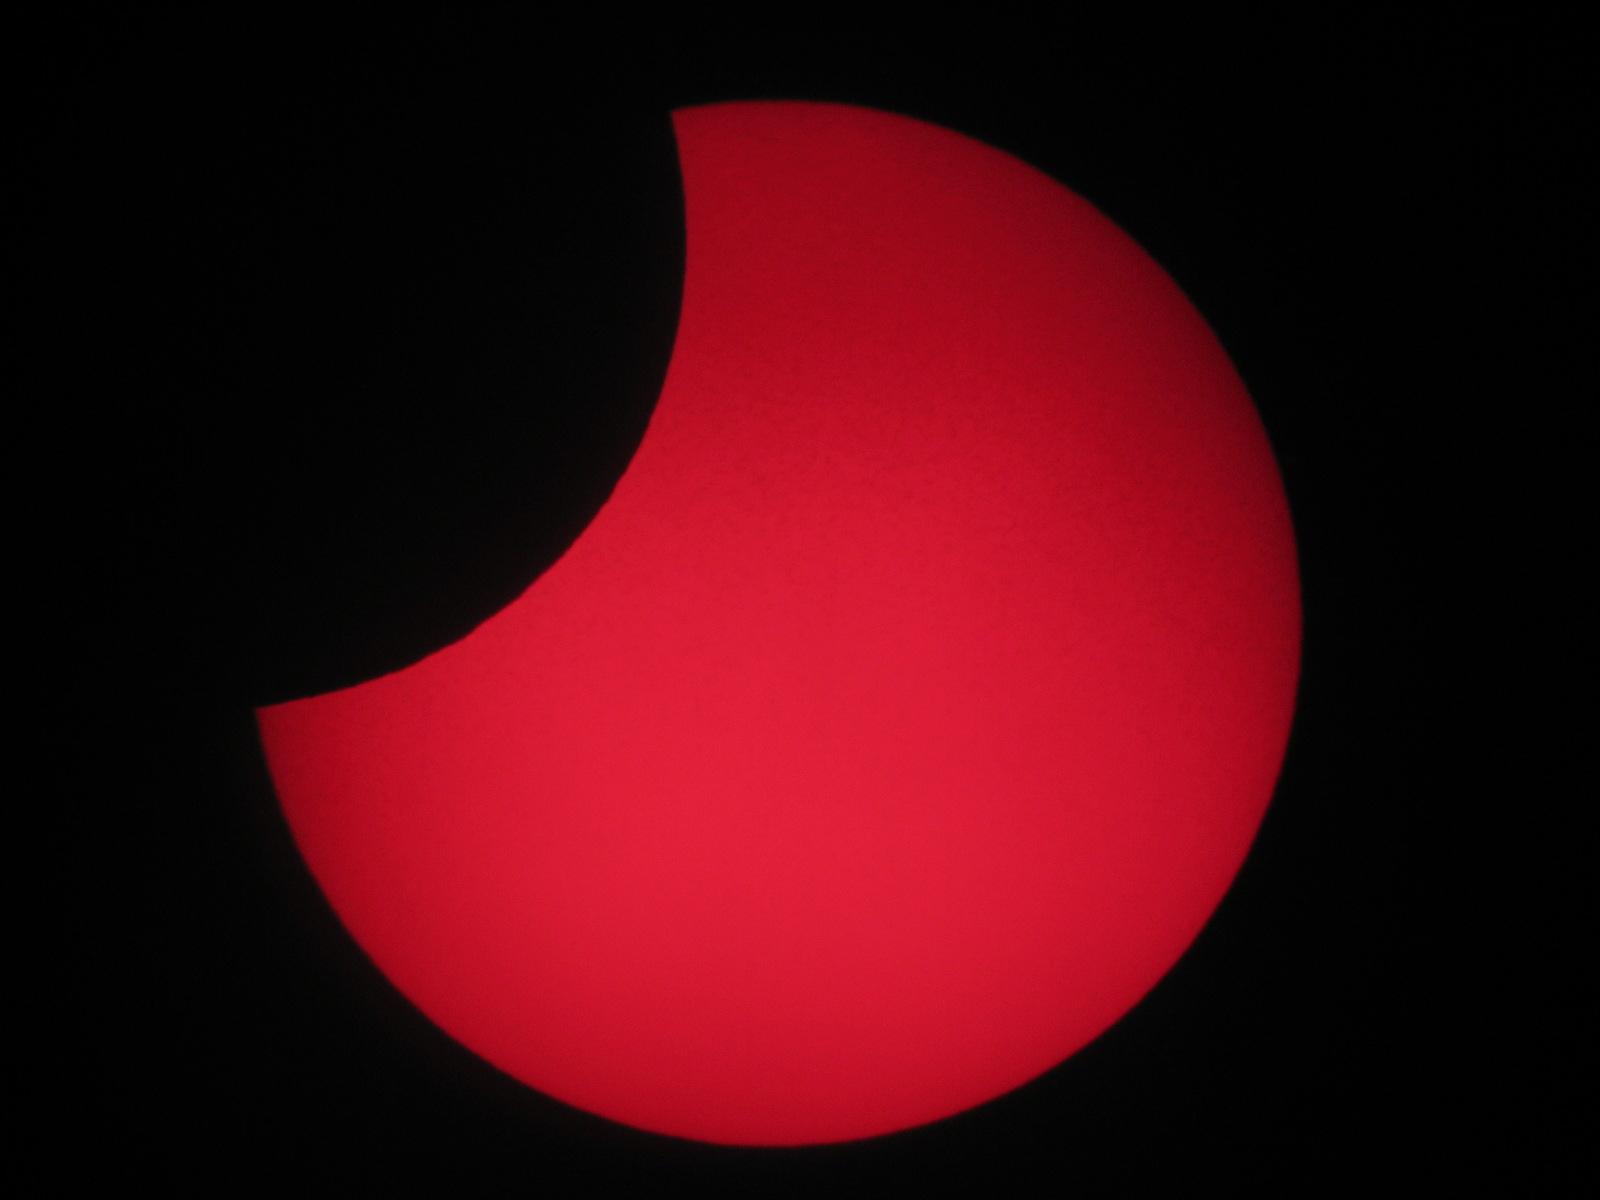 kerryn Murphy - aswa  p eclipse 26 1 09 city beach 118